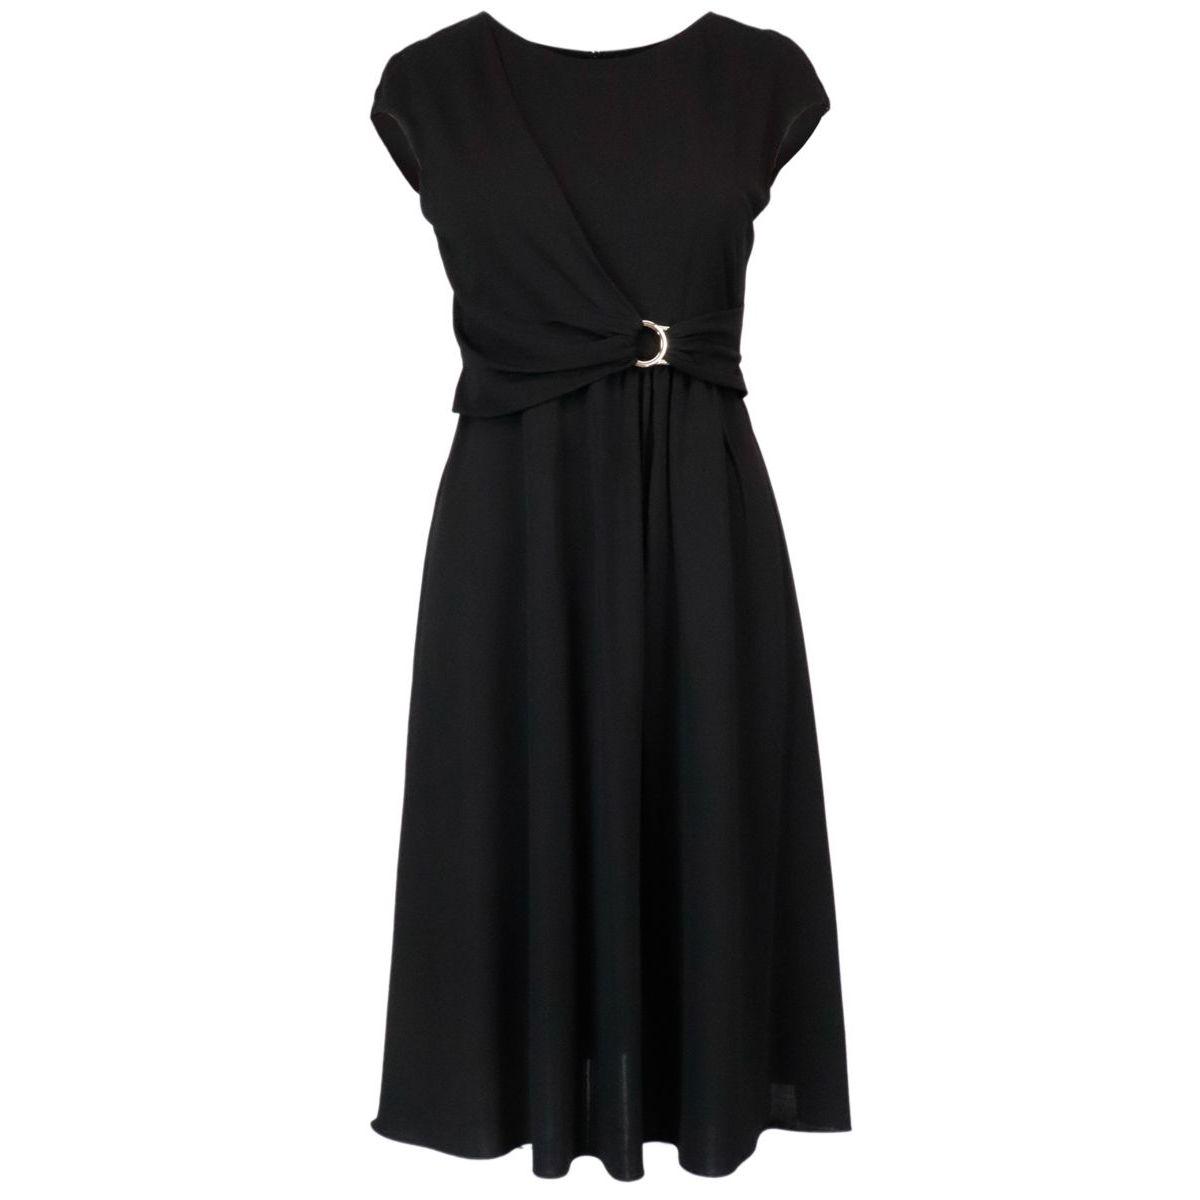 Antares midi dress in soft viscose Black Max Mara